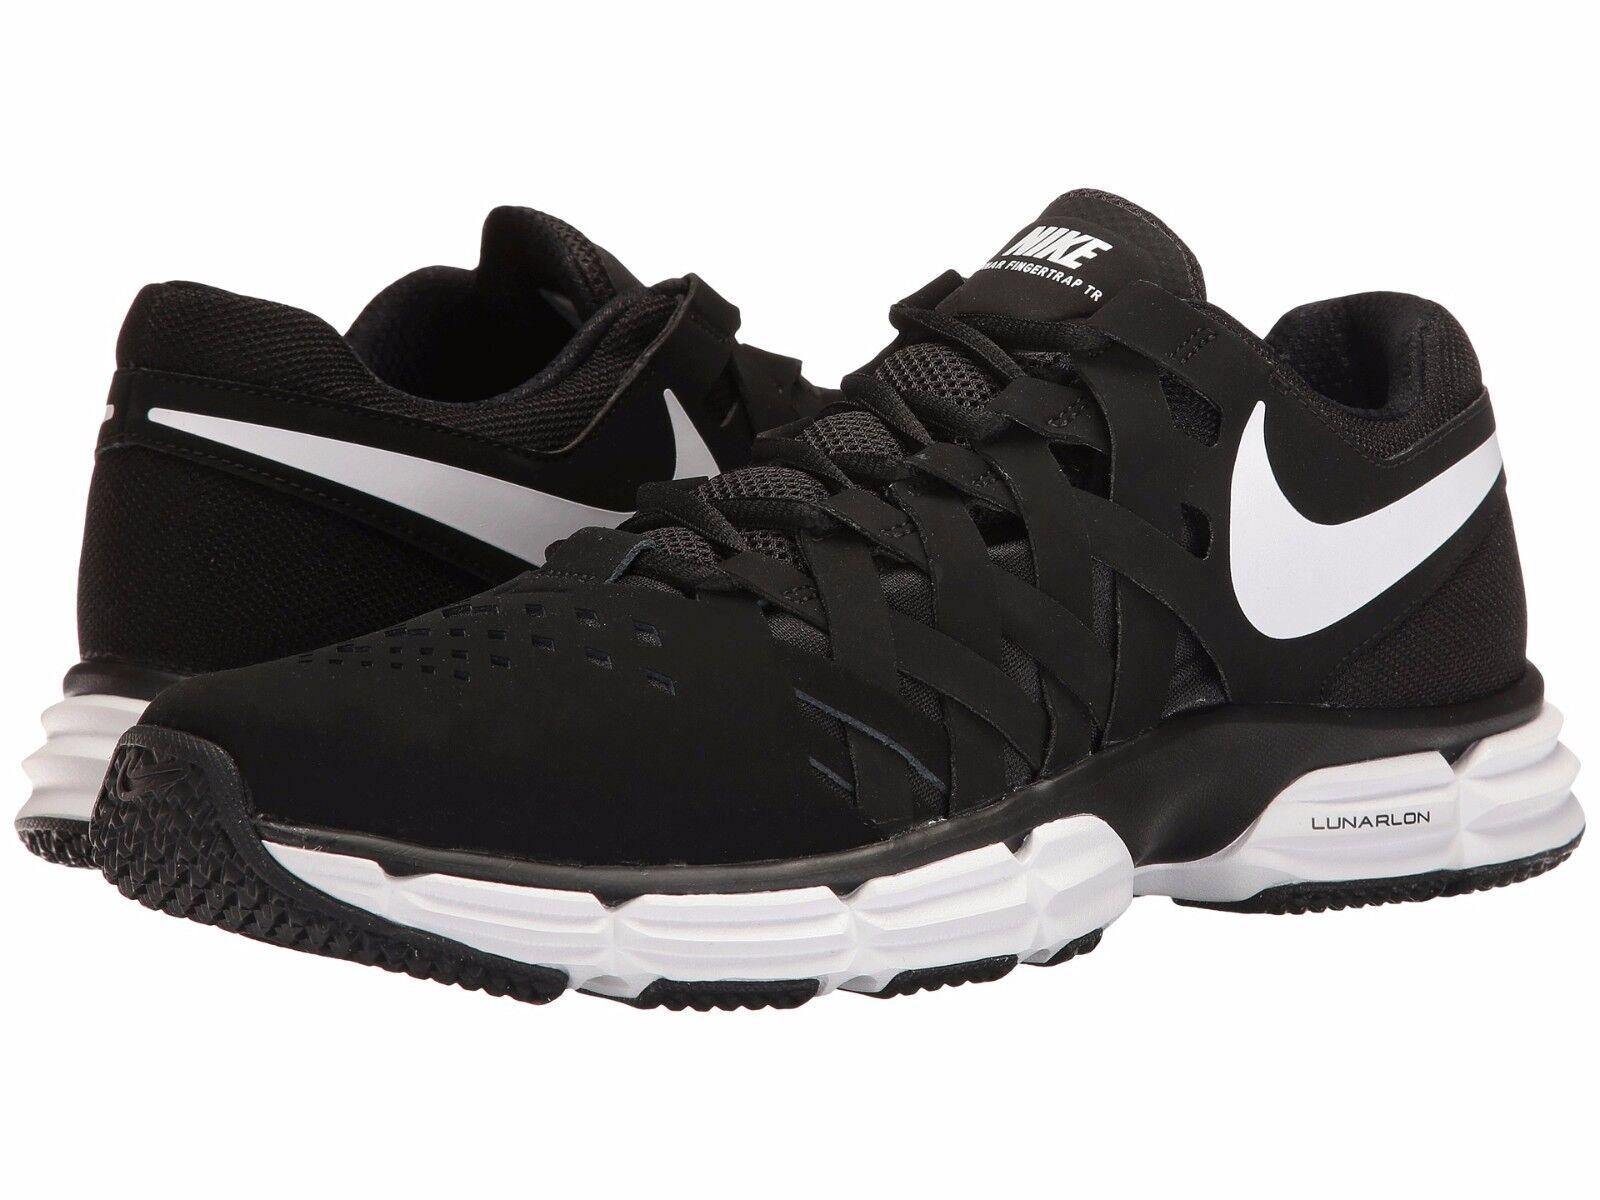 NIB Men's Nike Lunar Fingertrap TR Running Shoes Revolution Black